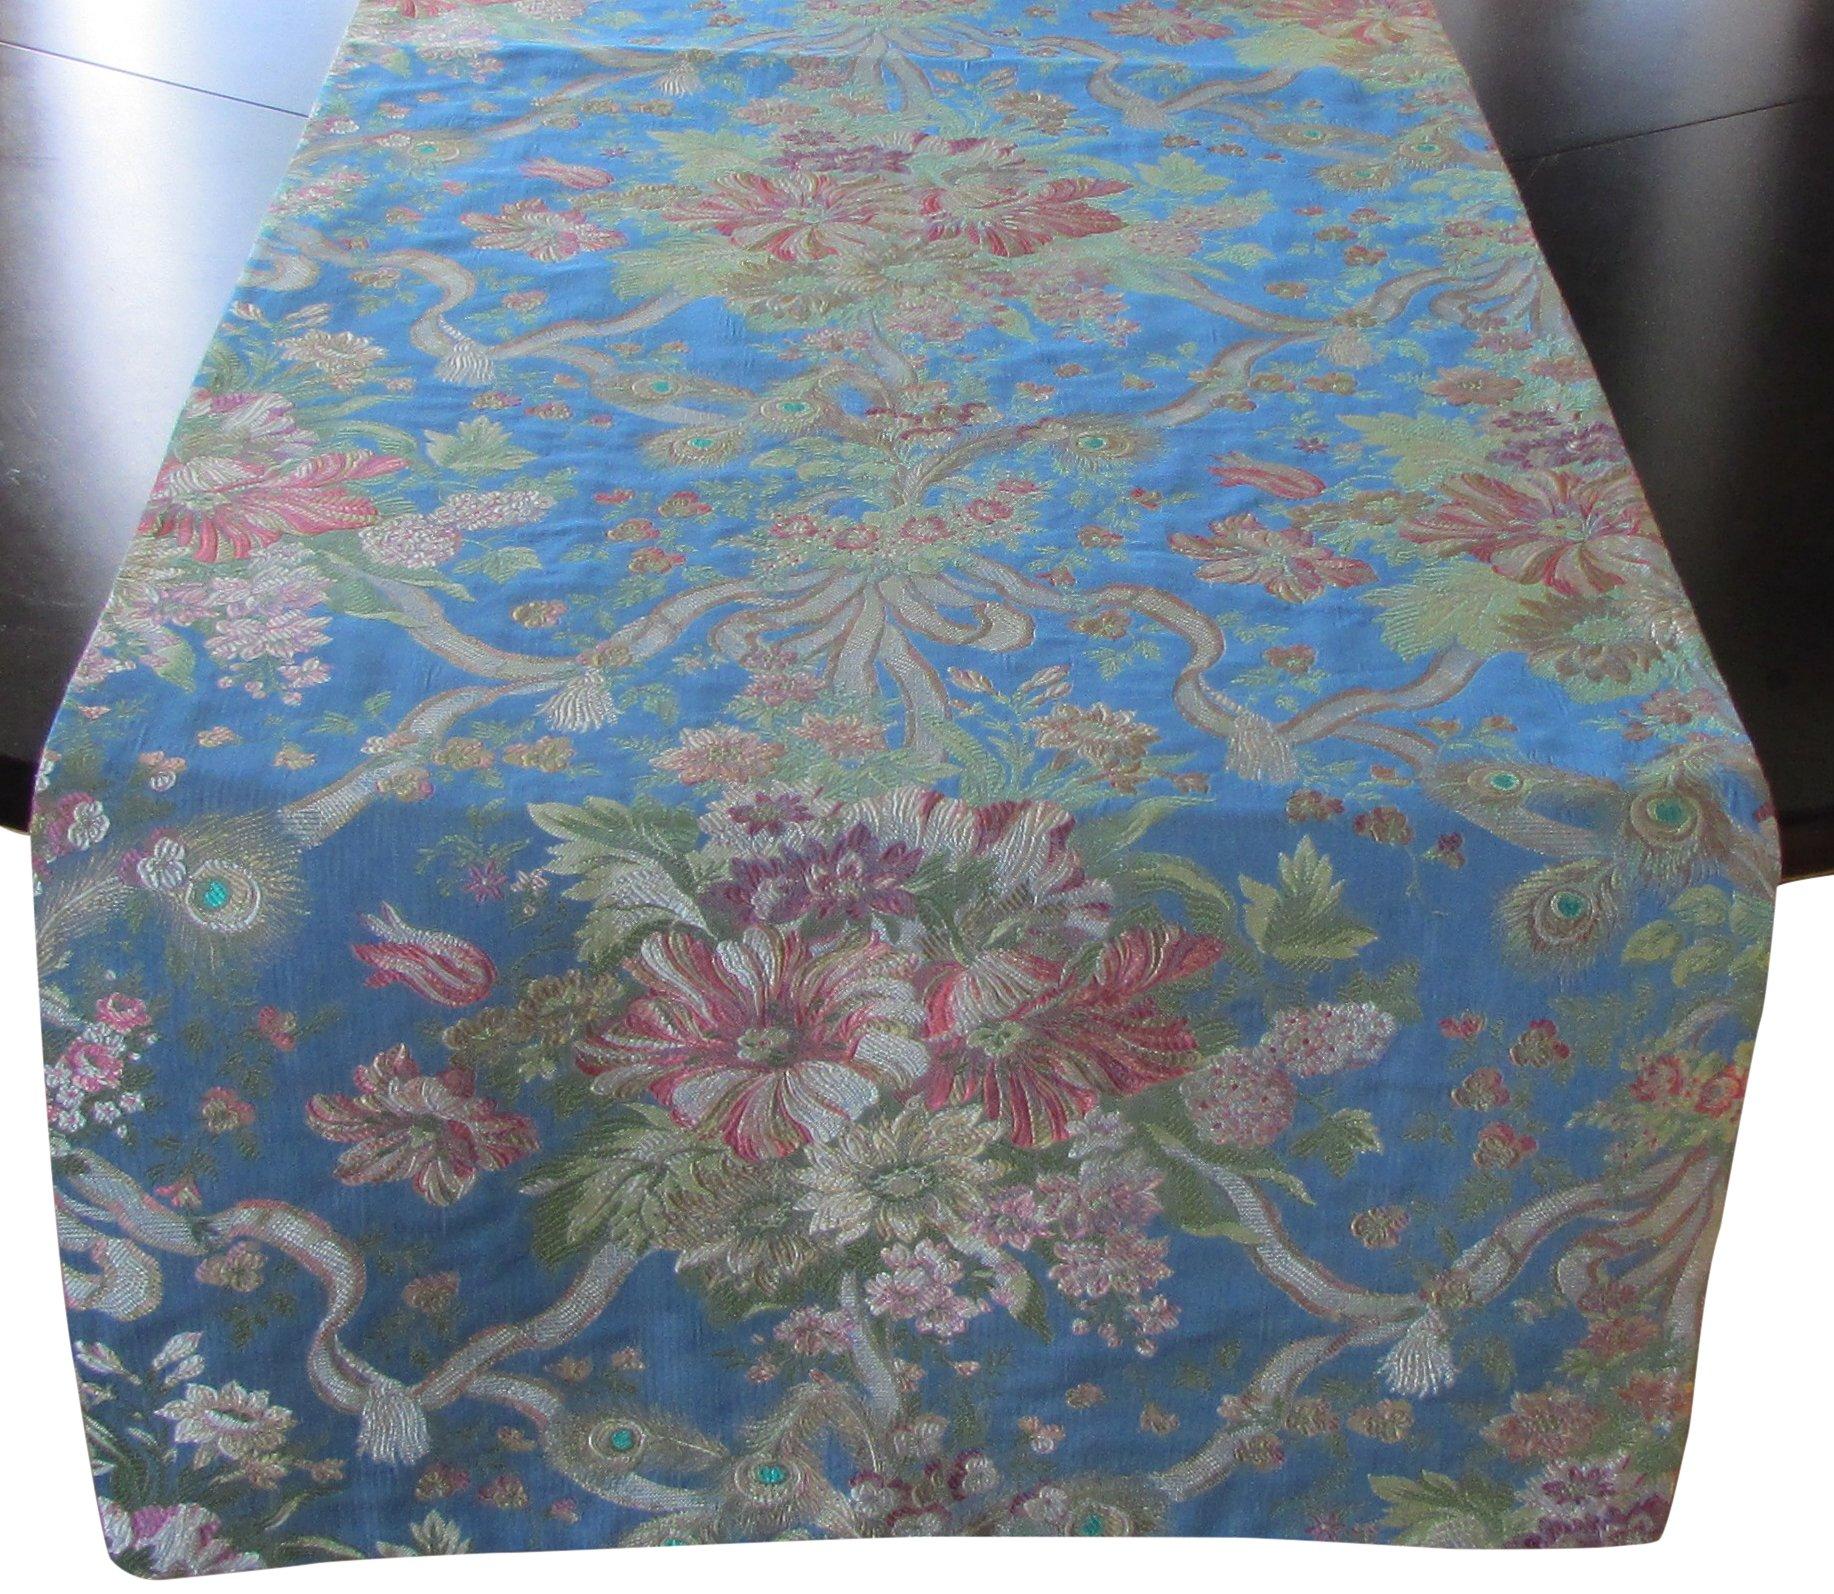 Corona Decor Extra-Wide Italian Woven Table Runner, 95 by 26-Inch, Blue/Rose by Corona Decor Co.